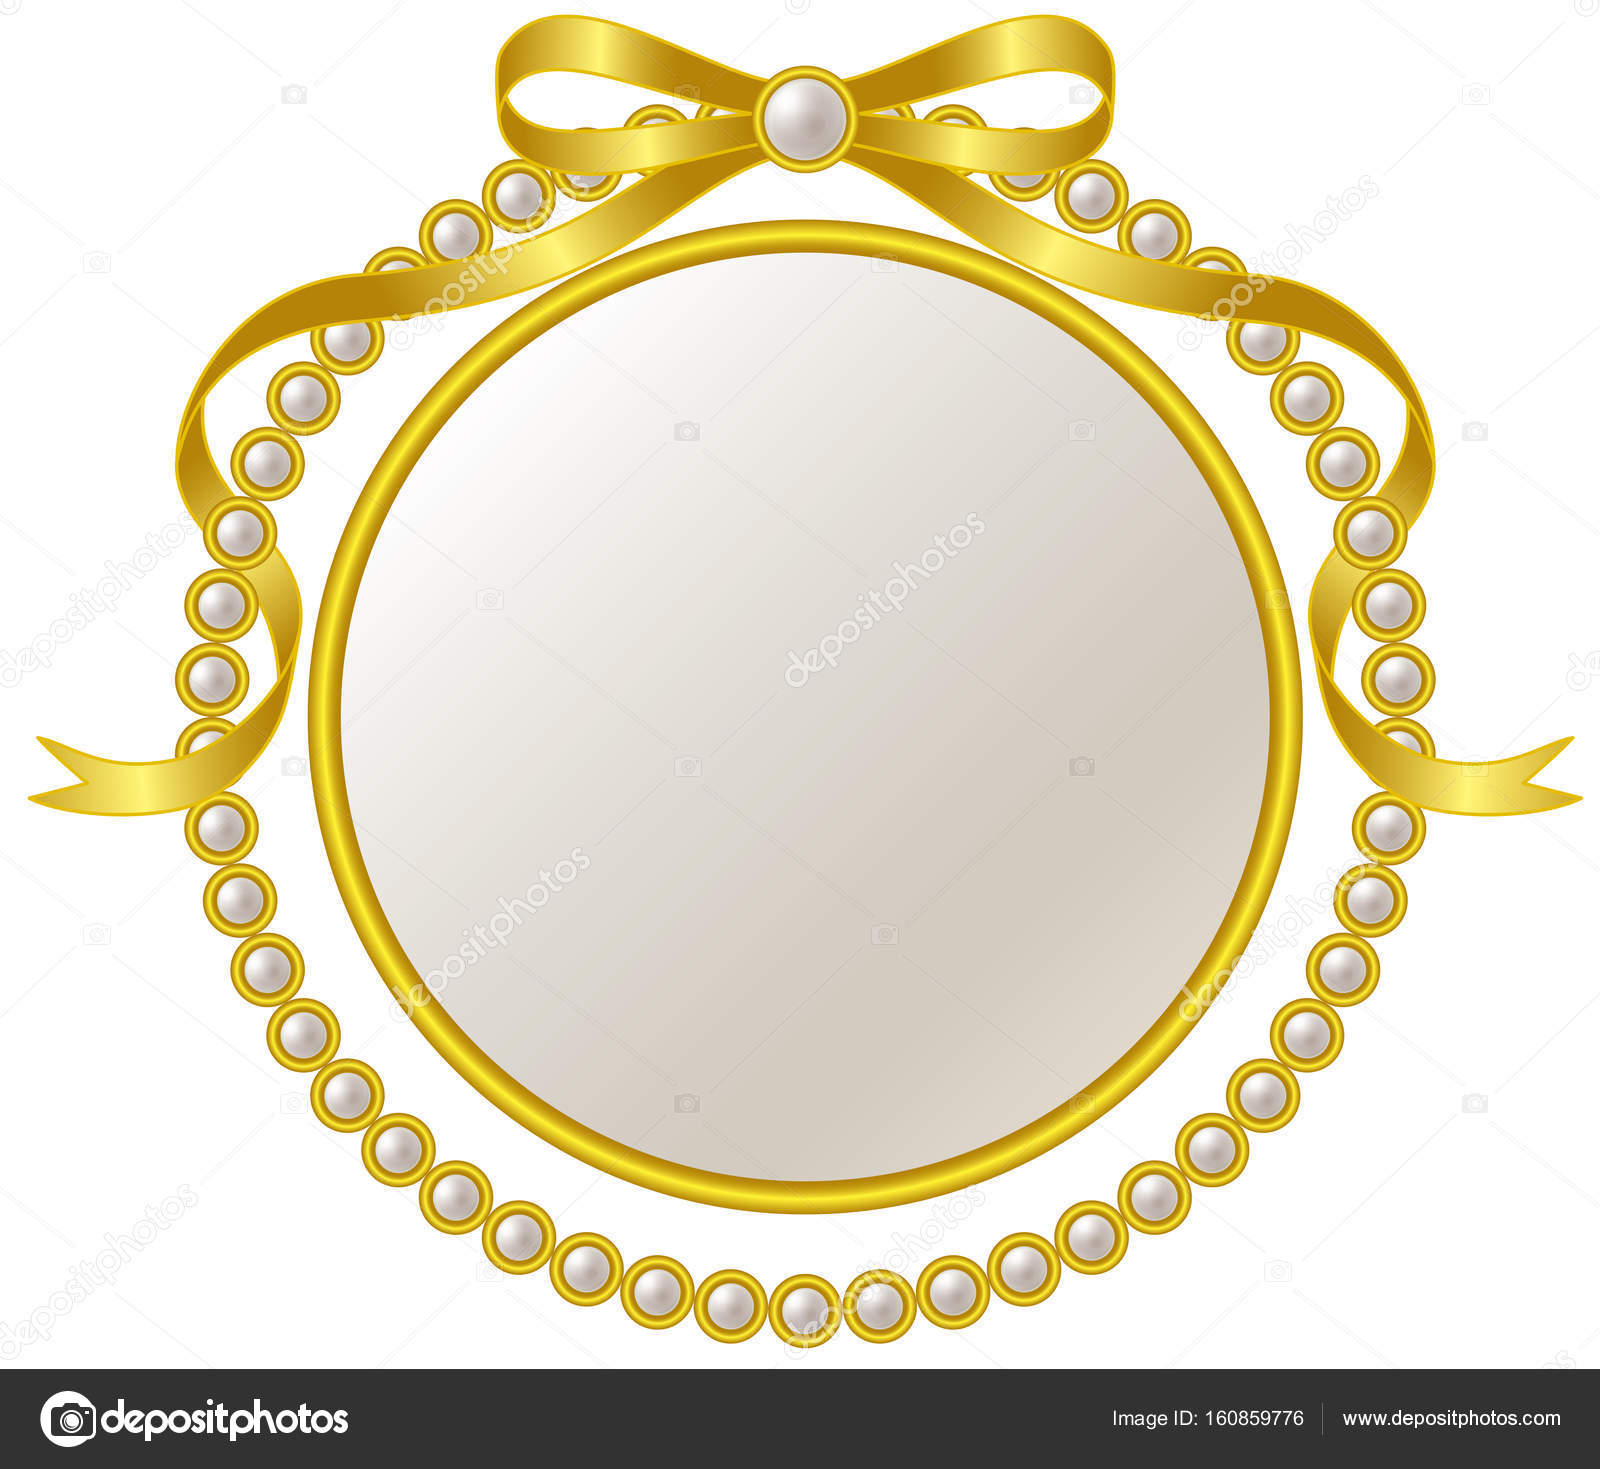 Rahmen und Perle Farbband Gold — Stockvektor © alphabetMN #160859776